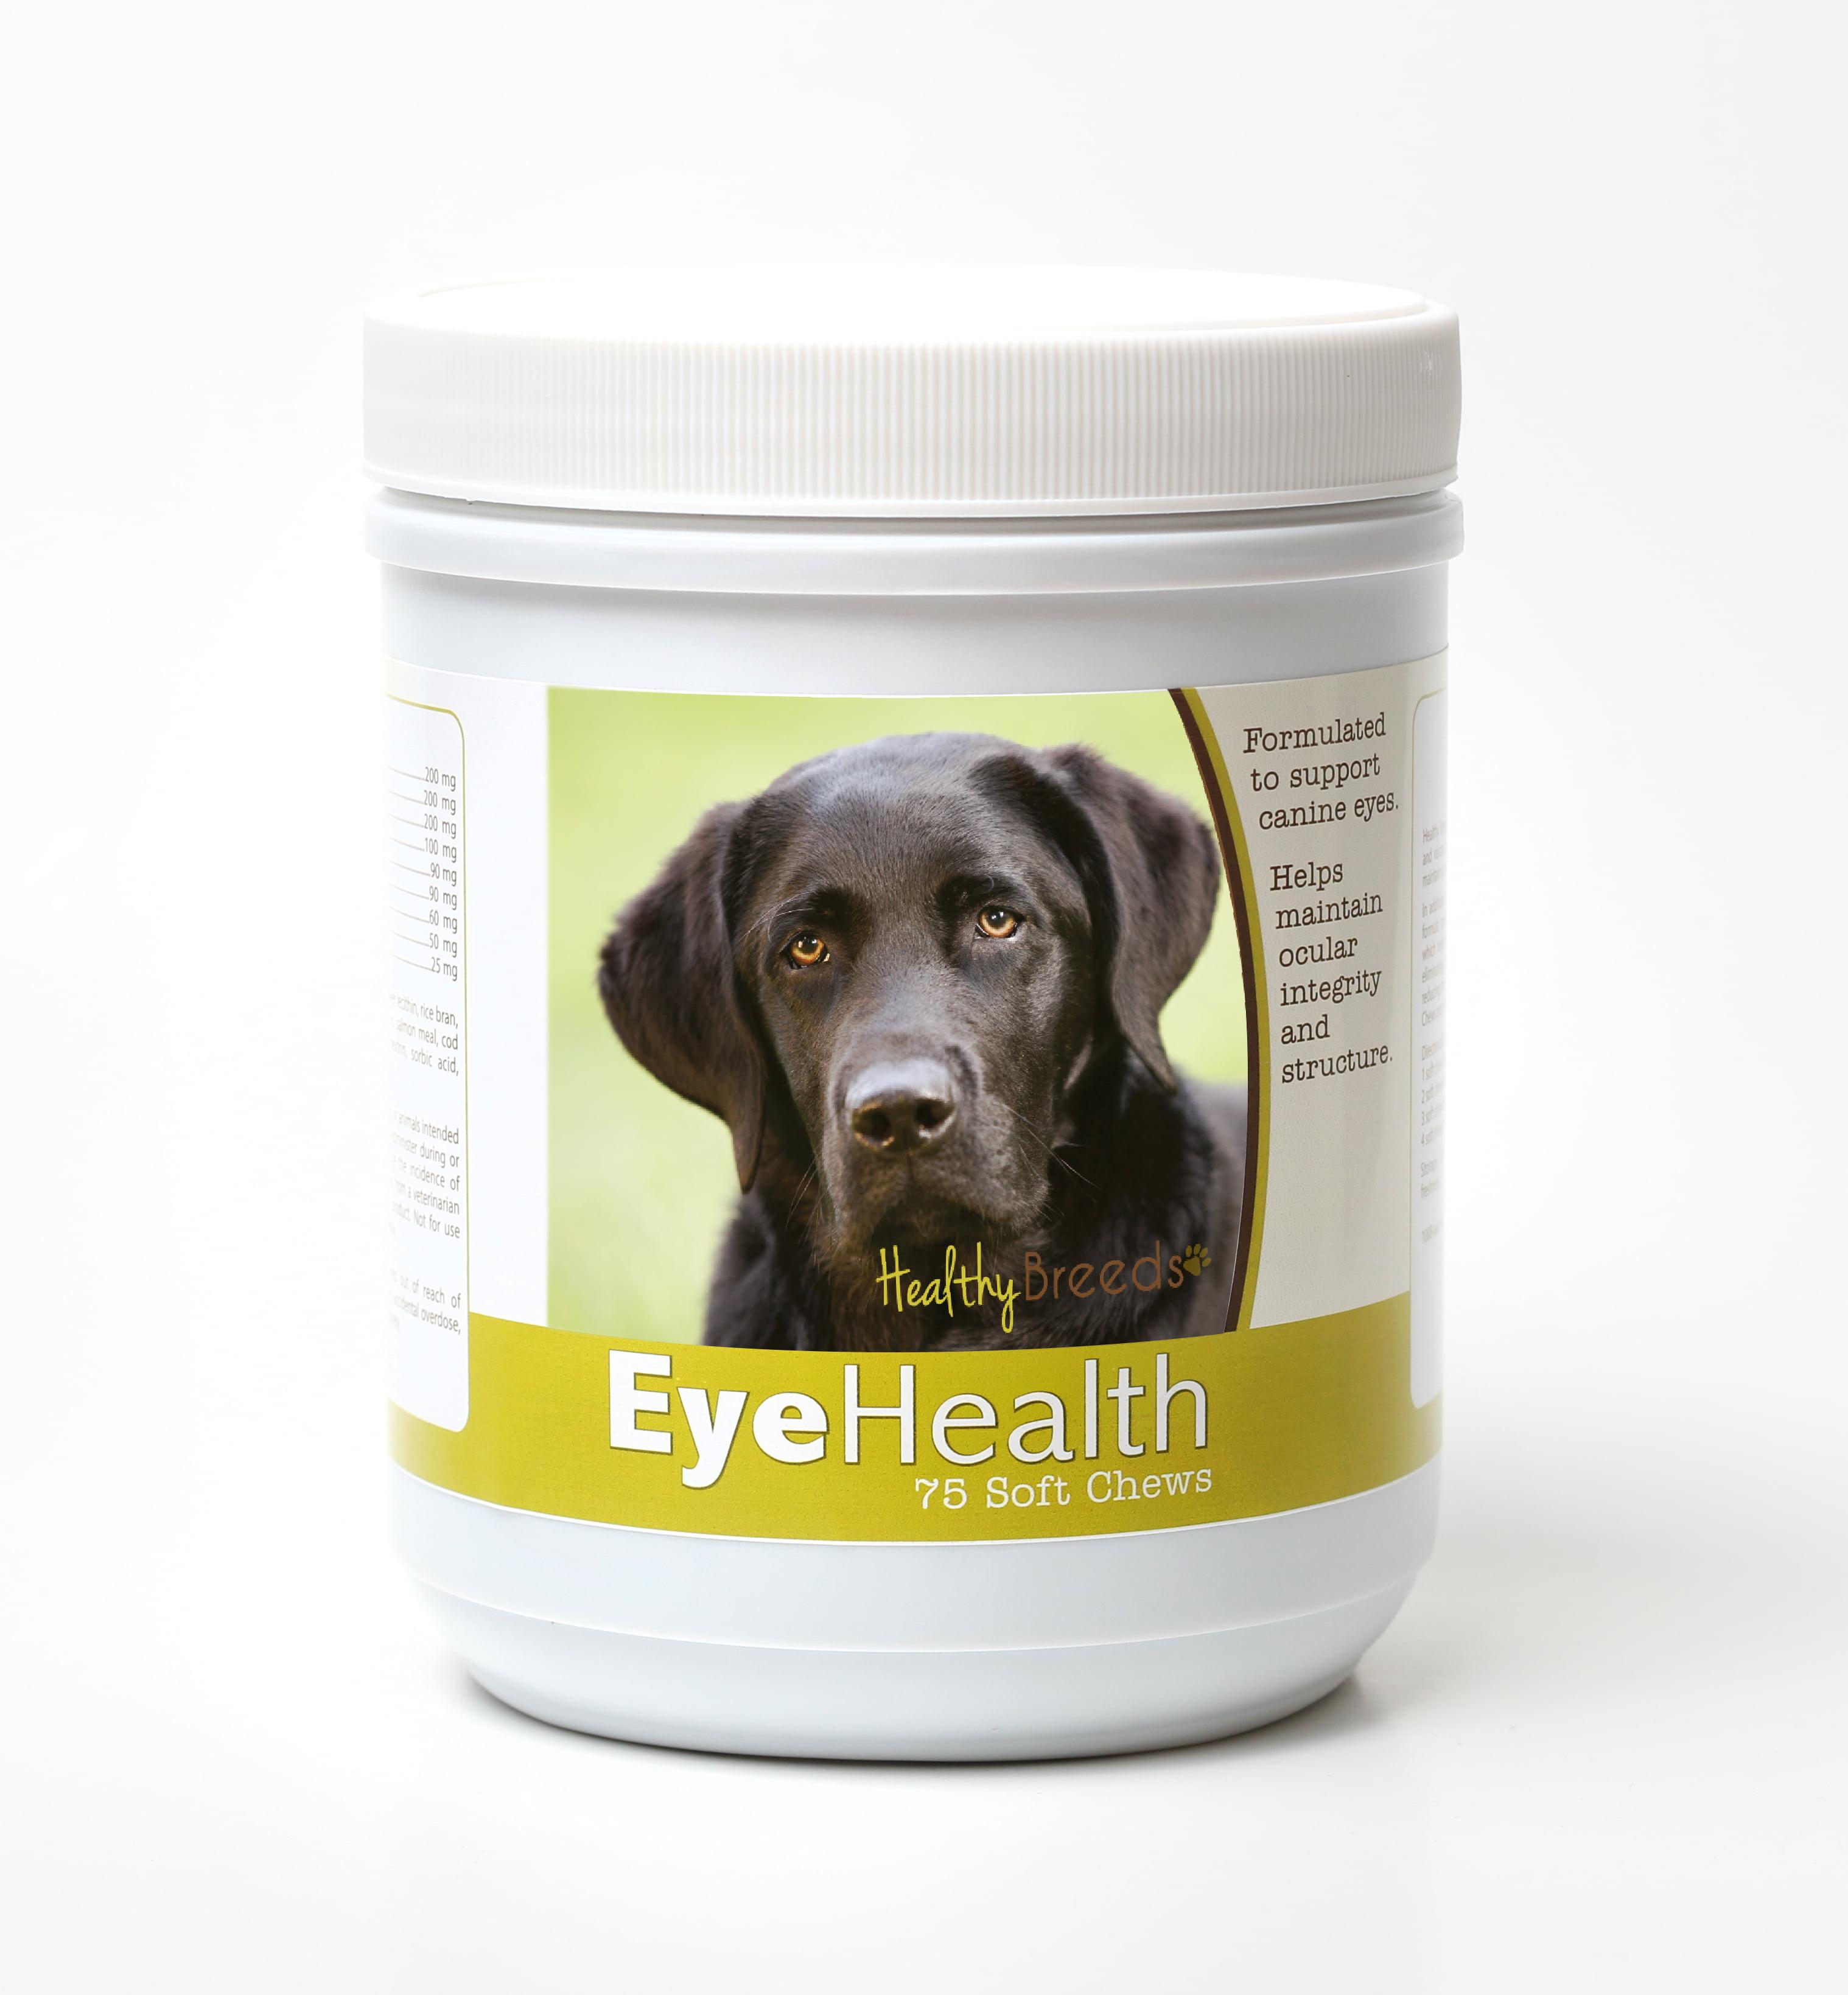 Healthy Breeds Dog Eye Health Support Soft Chews for Labrador Retriever 75 Count